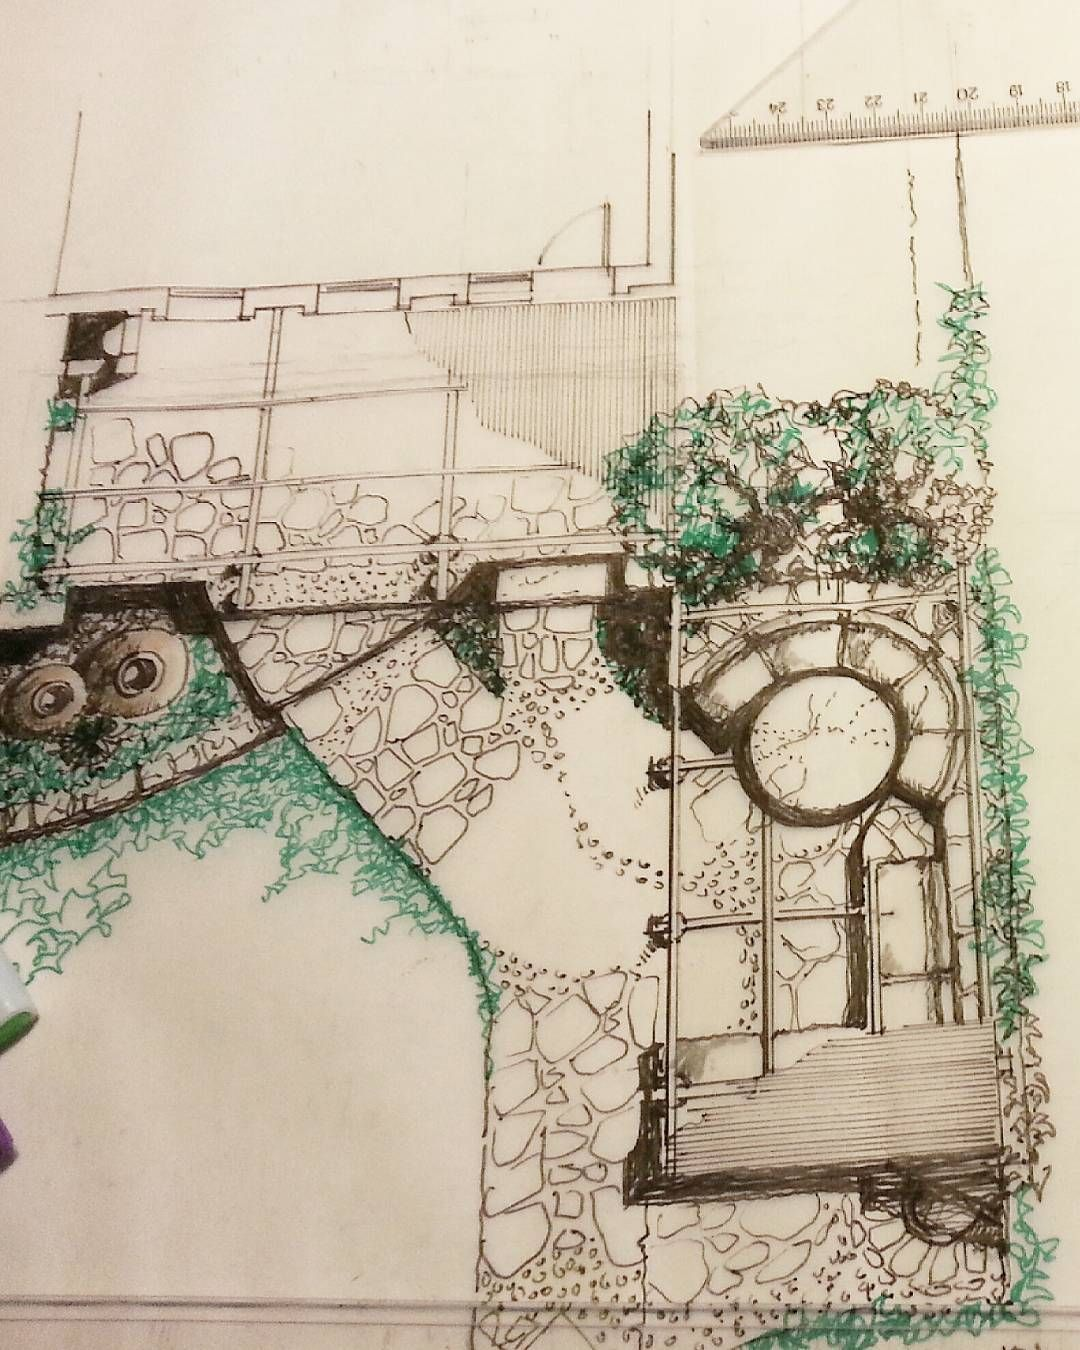 Landscape gardening sketch..#prizma #tasarım #design #architecture #homedecor #renovation #aplication #decoration #furniture #furnituredesign #mobilya #homestyle #sketch #pergola #garden #drawing by turony